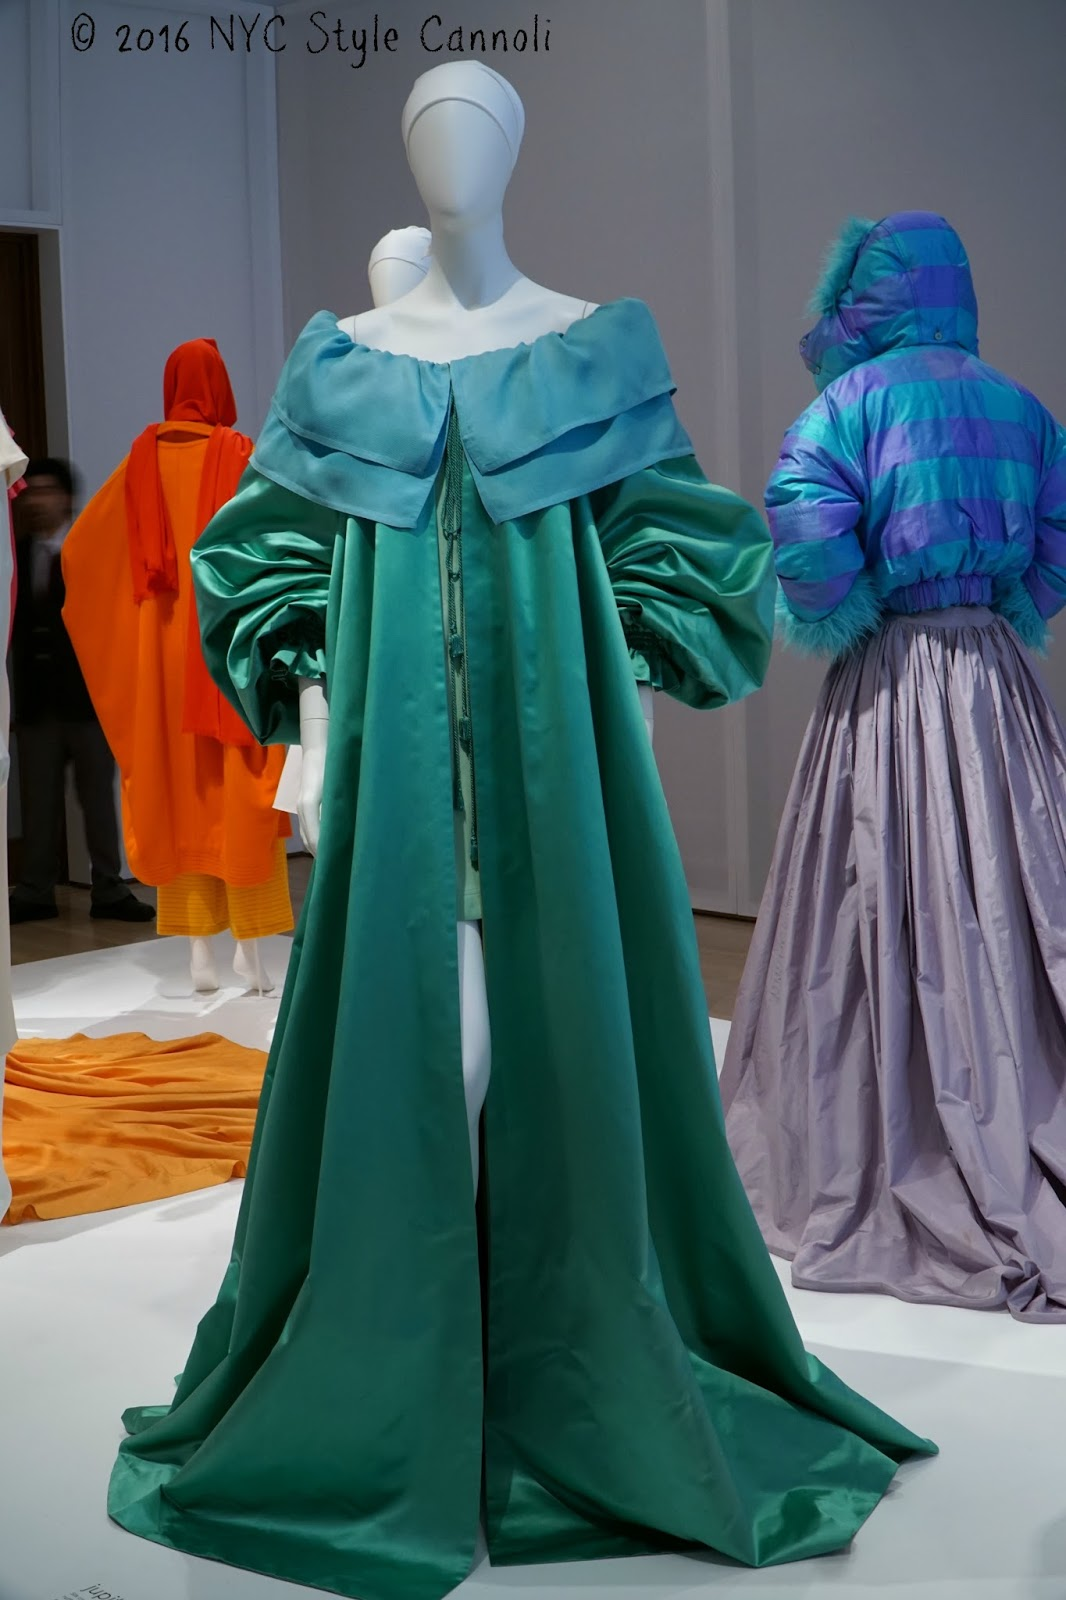 Target Wedding Dresses Isaac Mizrahi 61 Superb They really show you